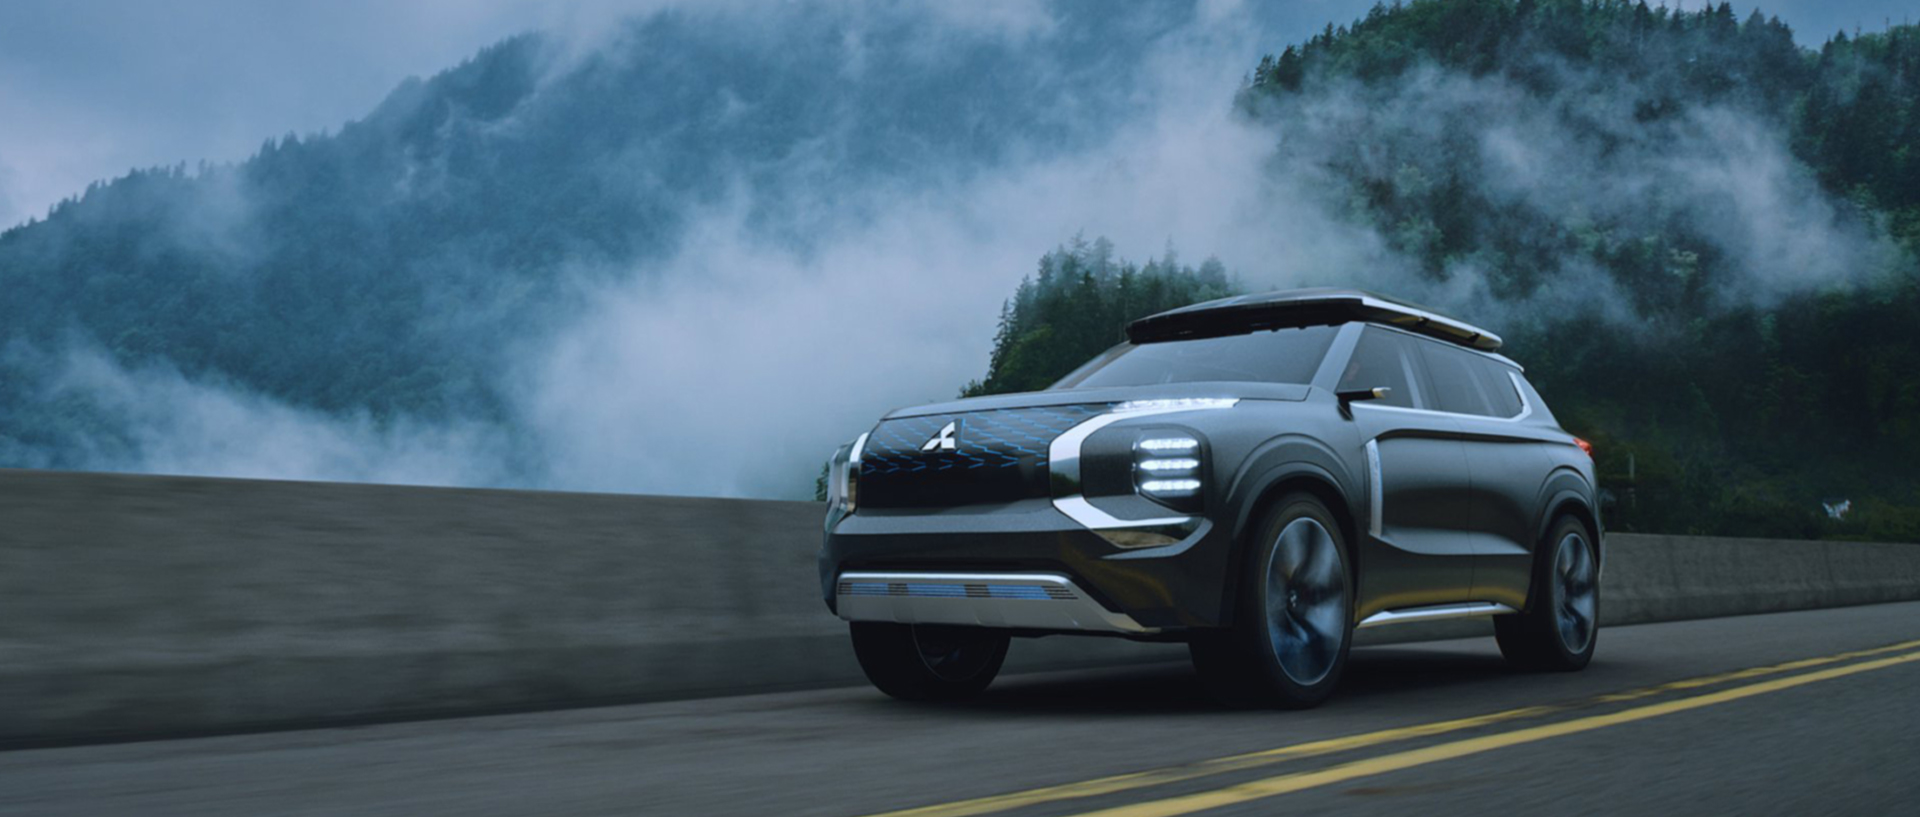 Mitsubishi –– eYi Concept